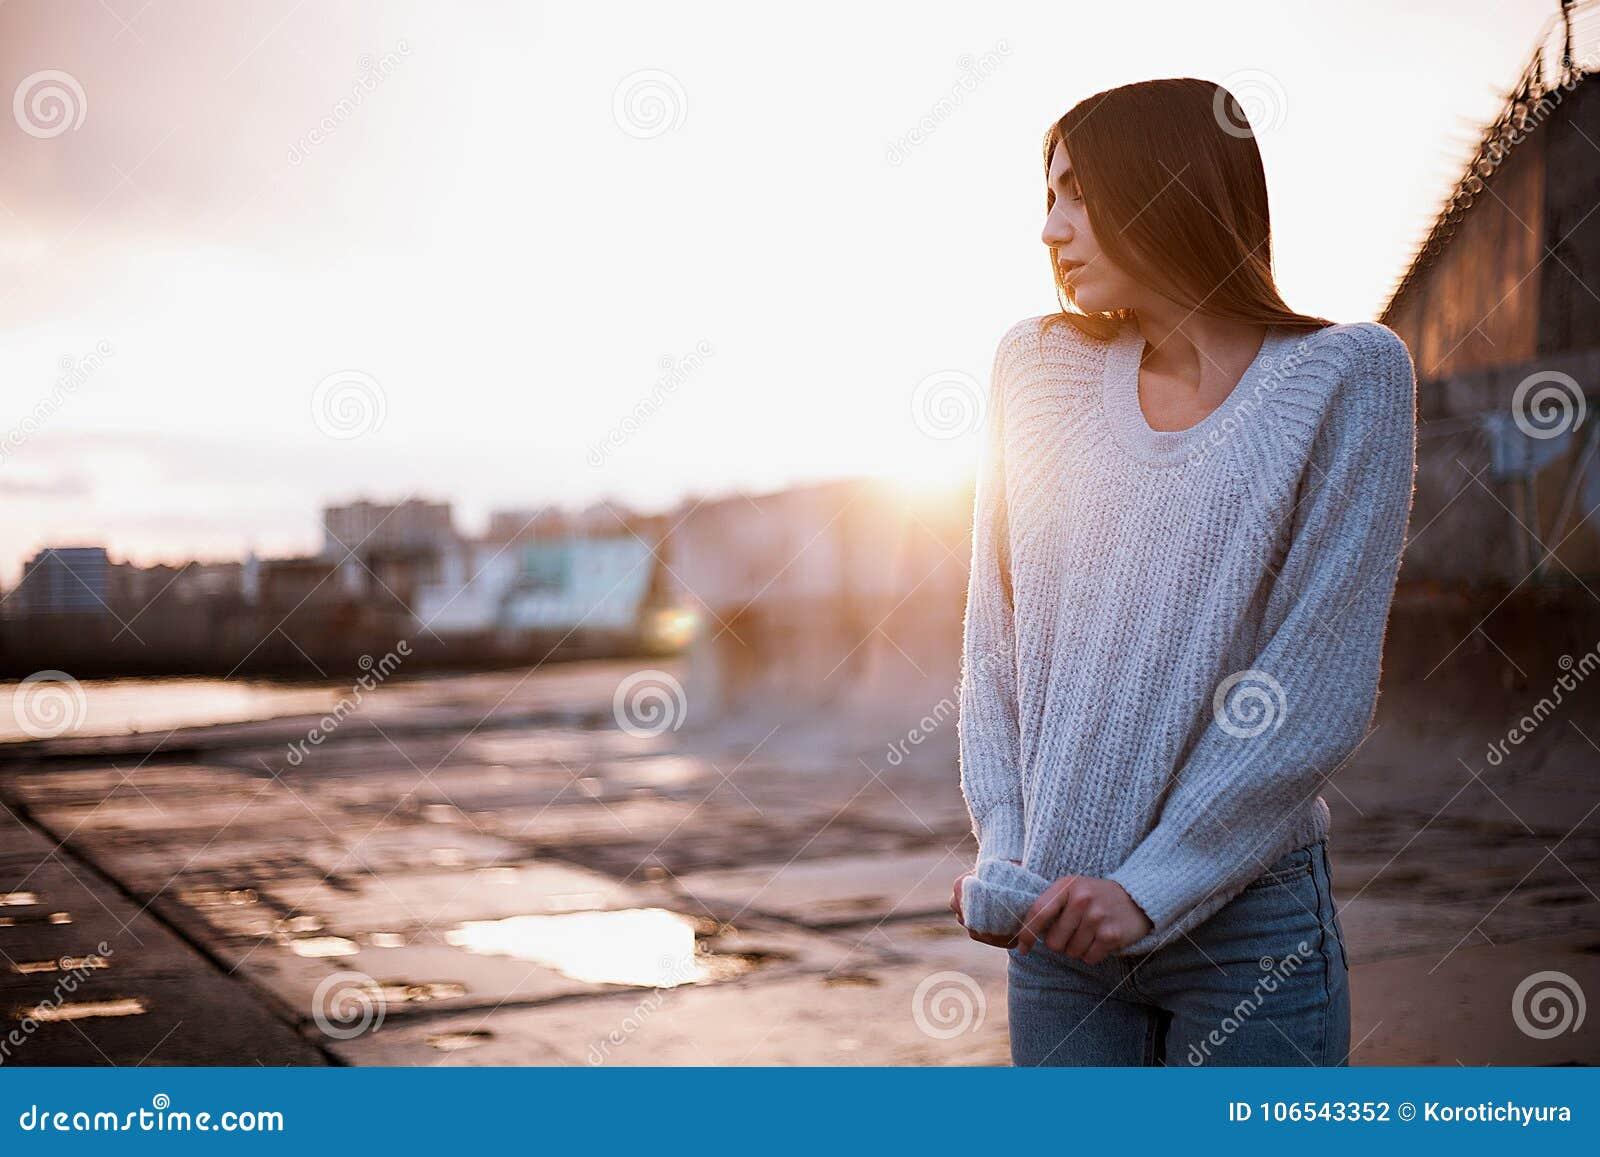 7cbc10c81e2e Κορίτσι σε ένα πουλόβερ κοντά στη θάλασσα Στοκ Εικόνες - εικόνα από ...